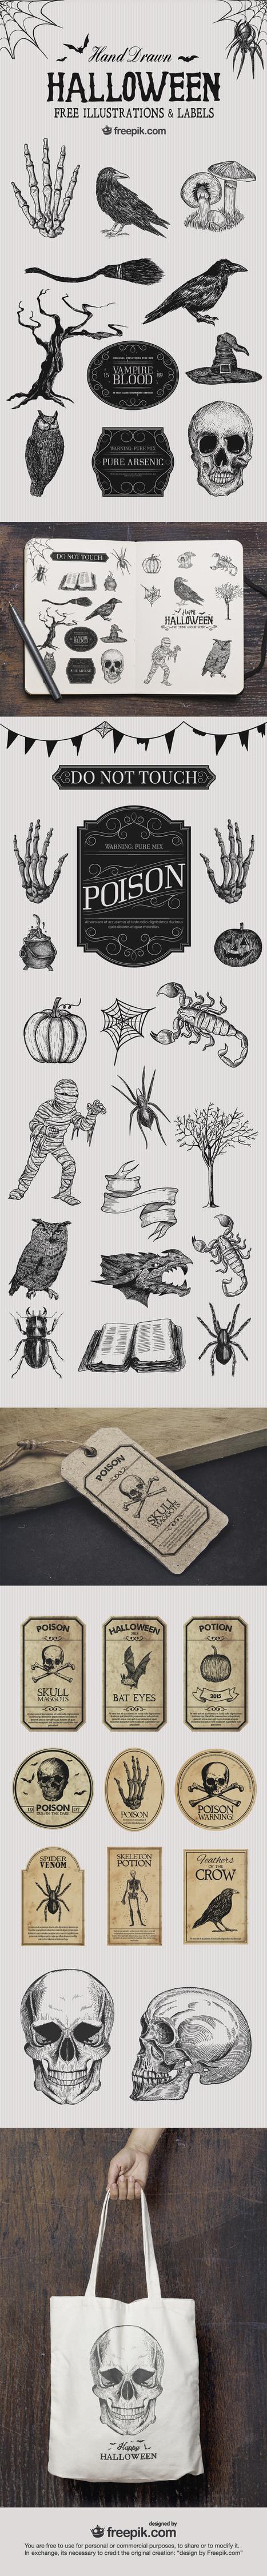 Free Halloween Illustrations | Web Design | Scoop.it